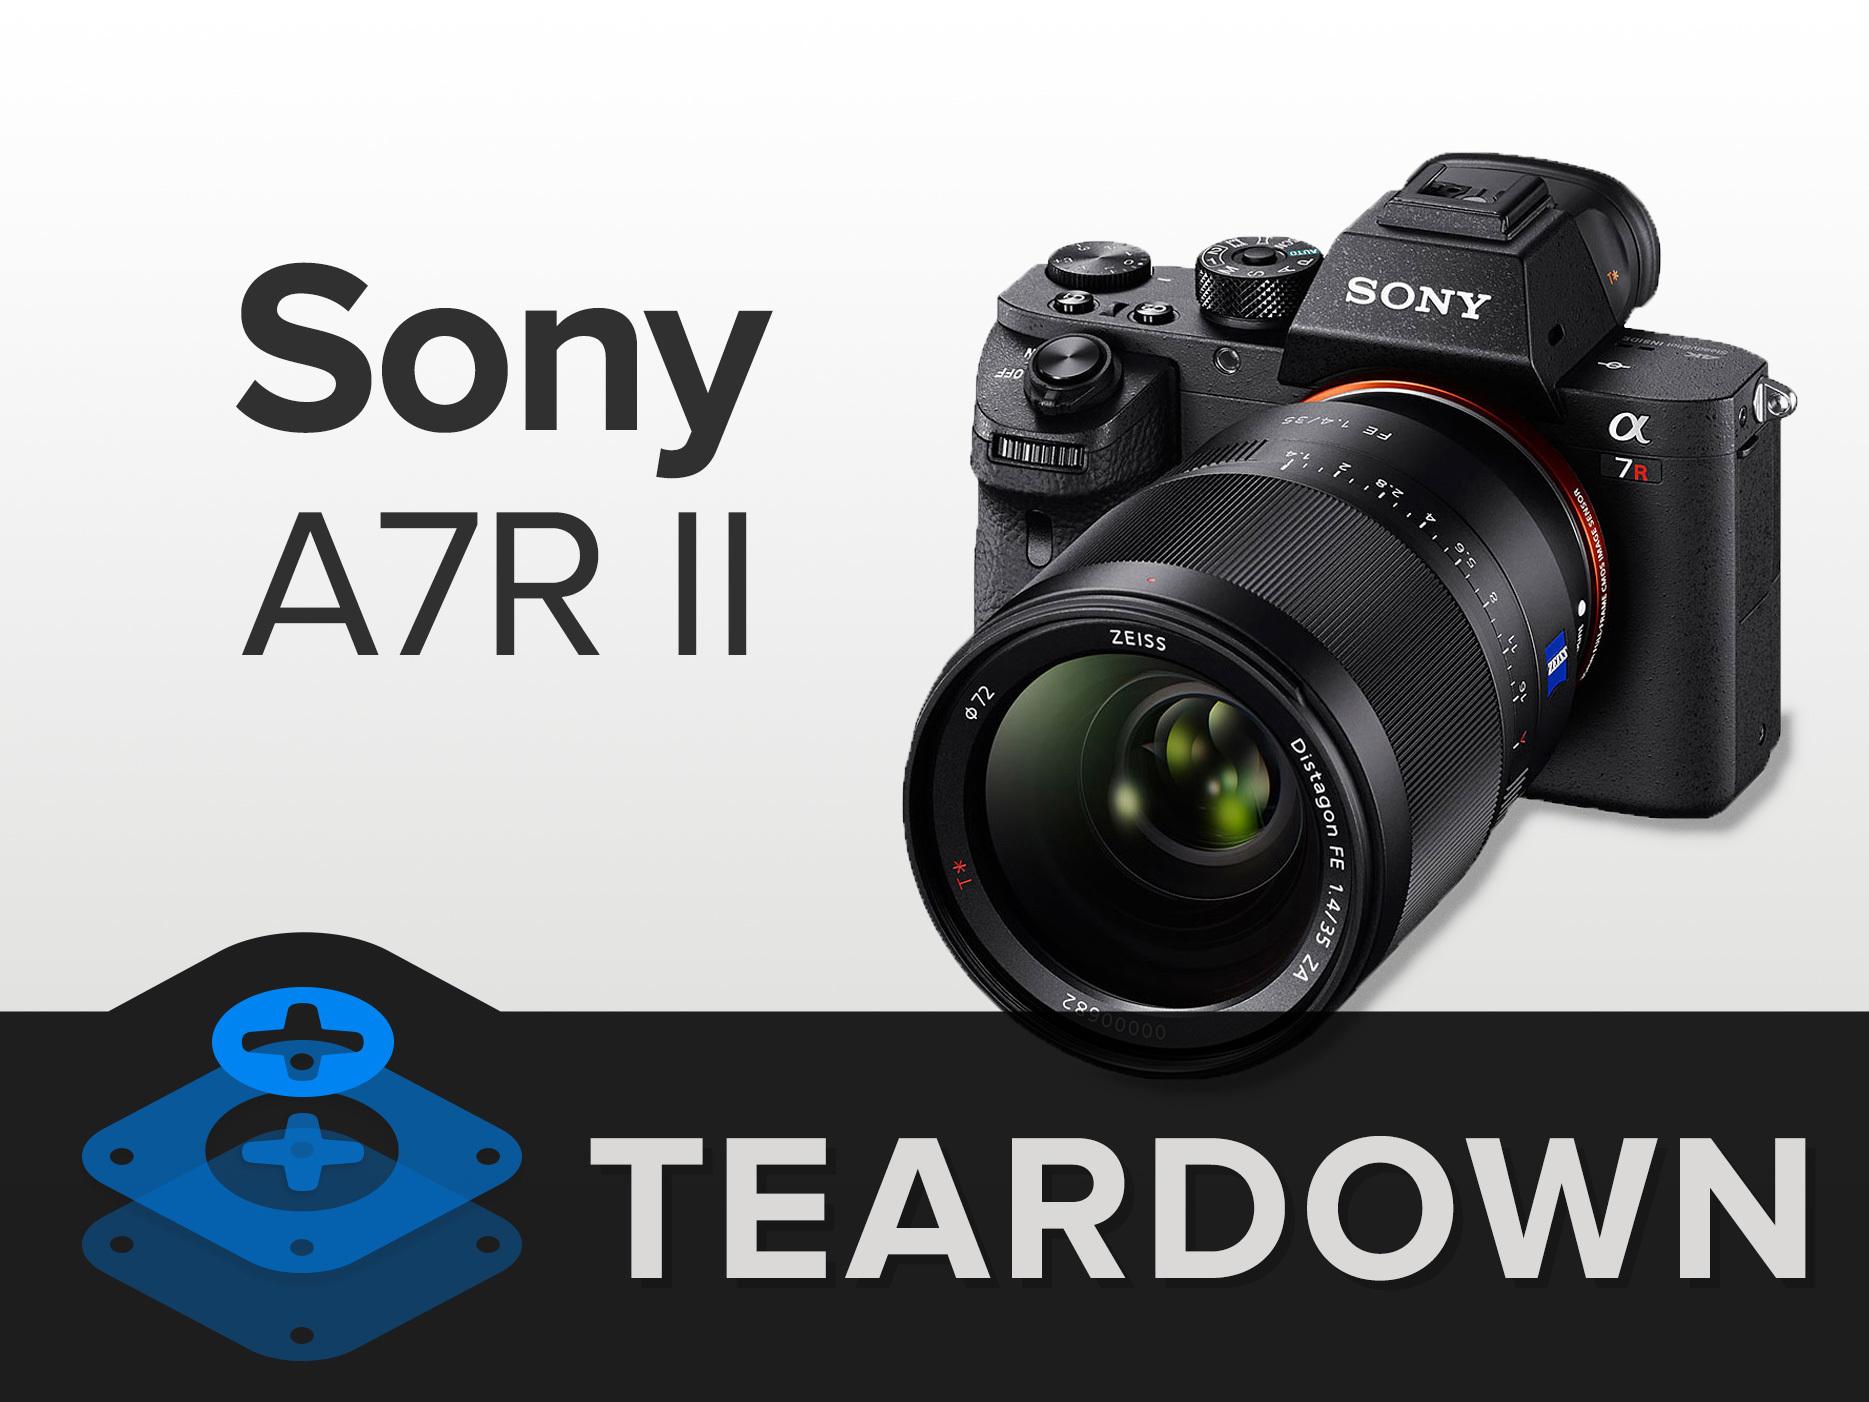 Sony A7r Ii Teardown Ifixit Diagram Of A Dslr Camera Digital Block